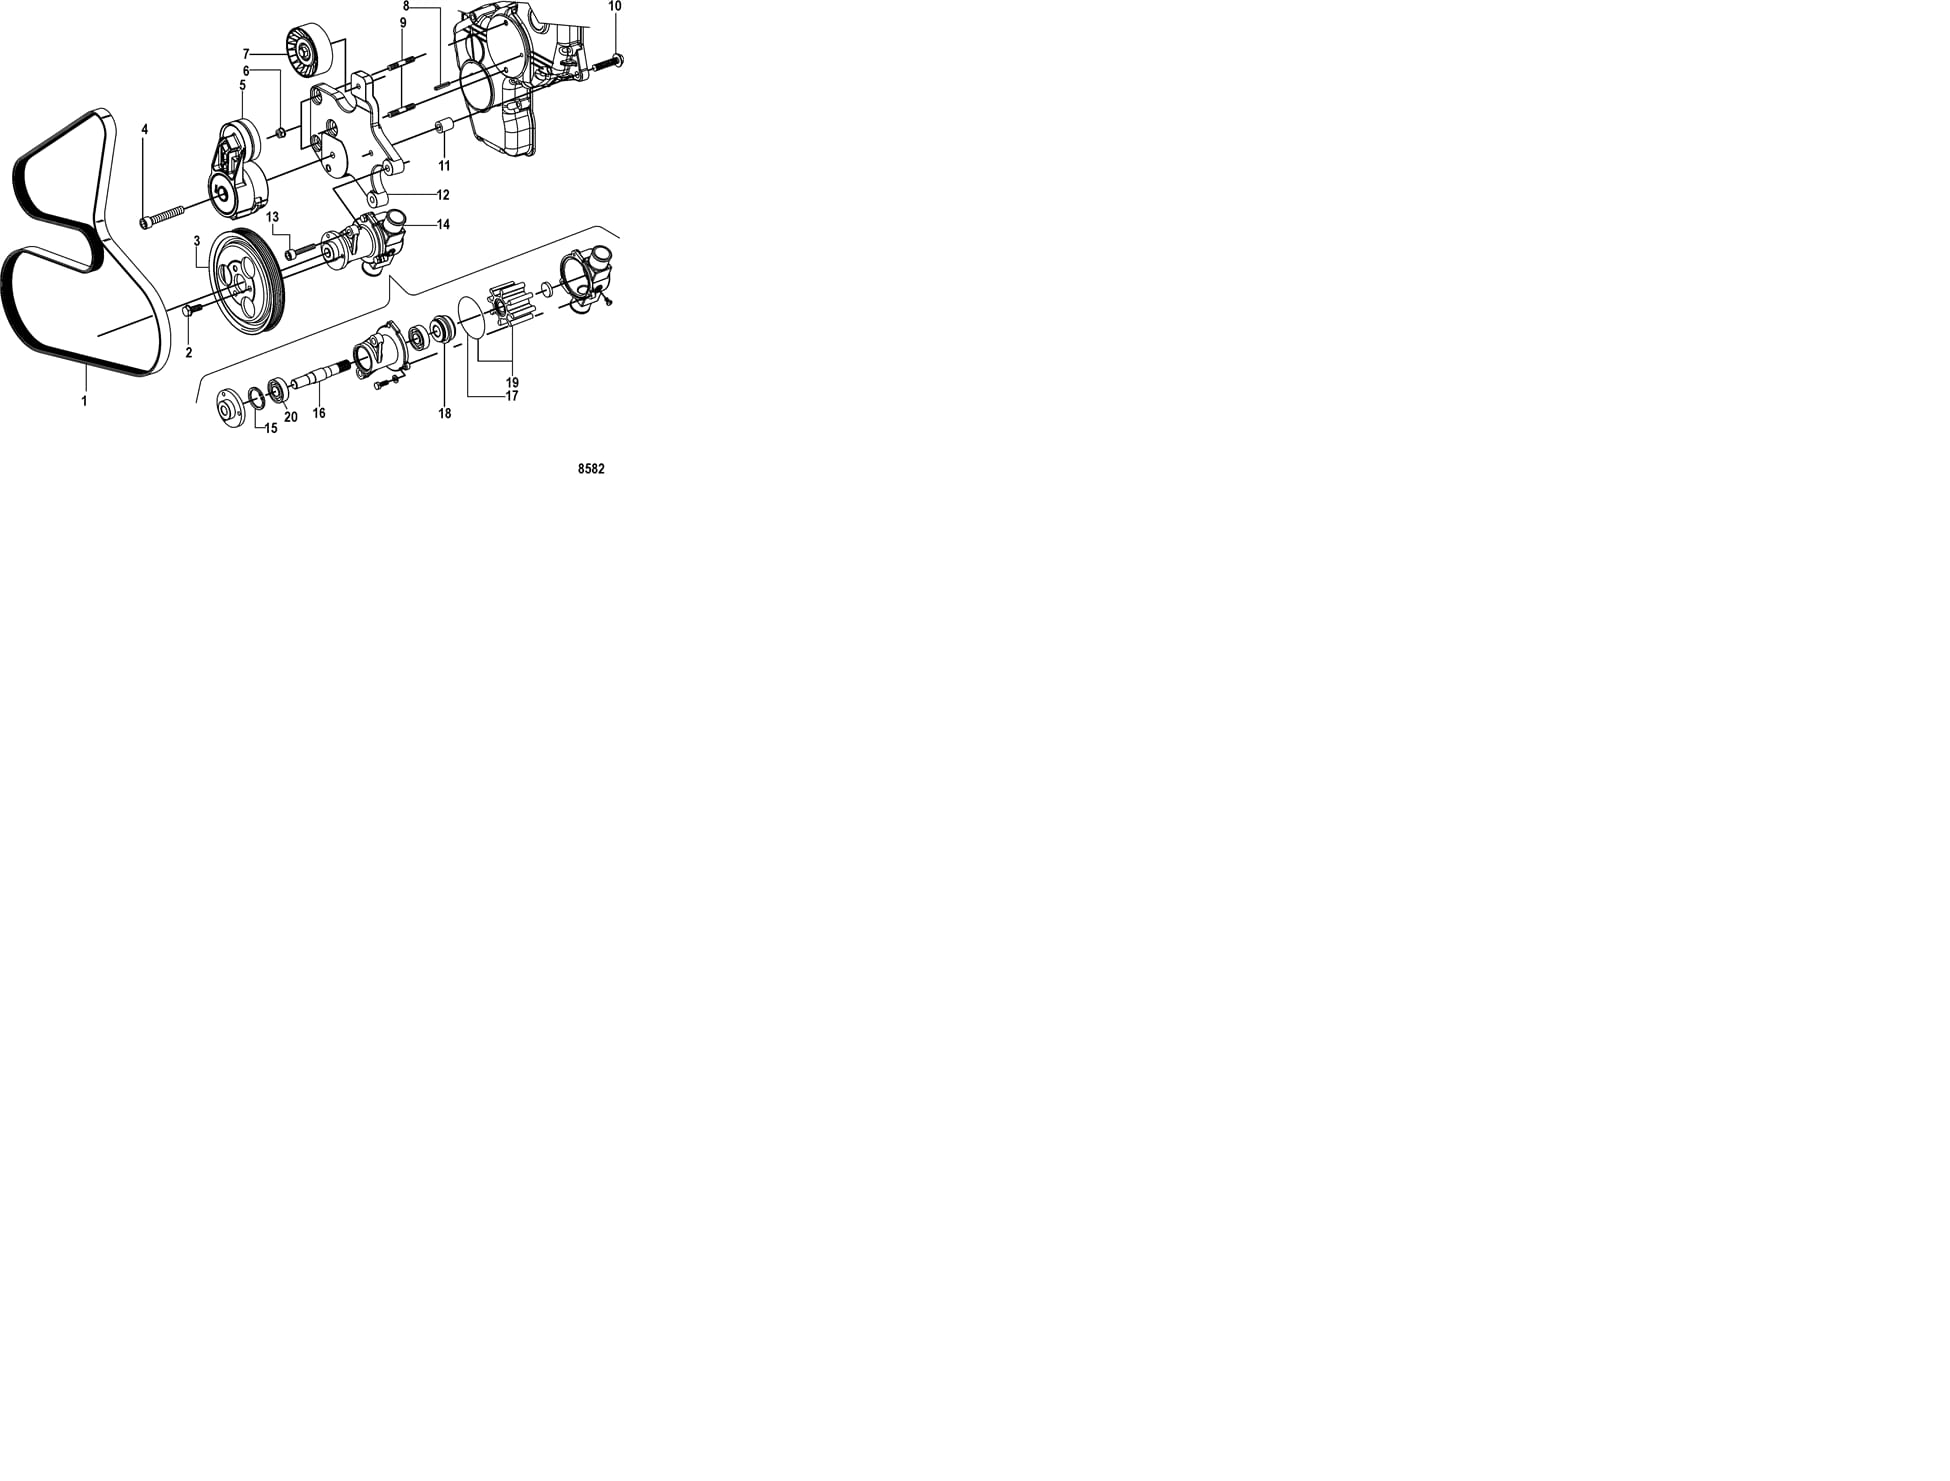 Mirage Boat Wiring Diagram